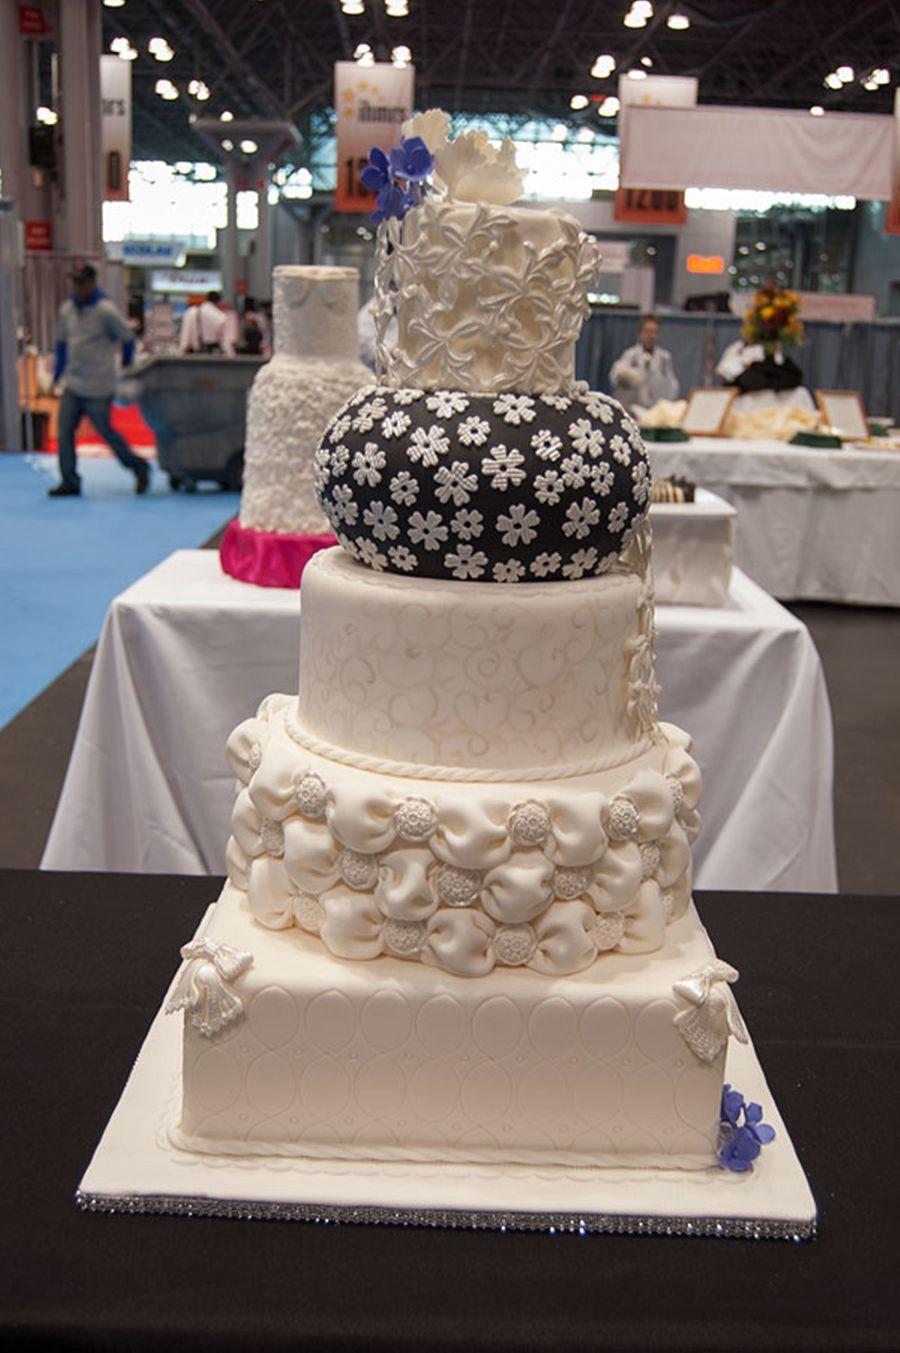 2012 societe culinaire philanthropique cake competition for Culinaire